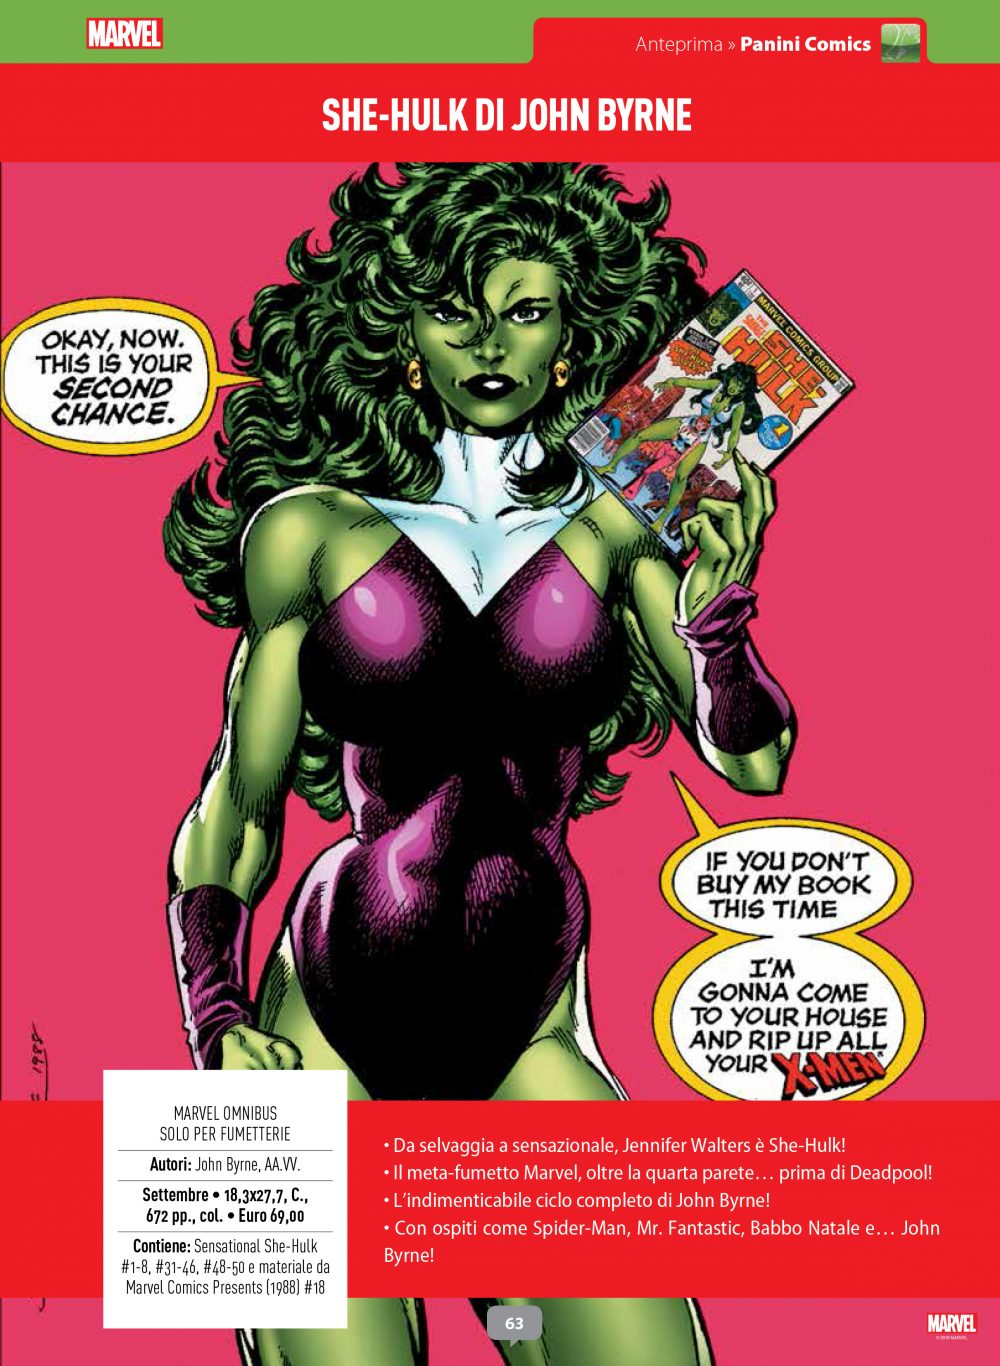 Marvel Omnibus - She-Hulk di John Byrne su Anteprima